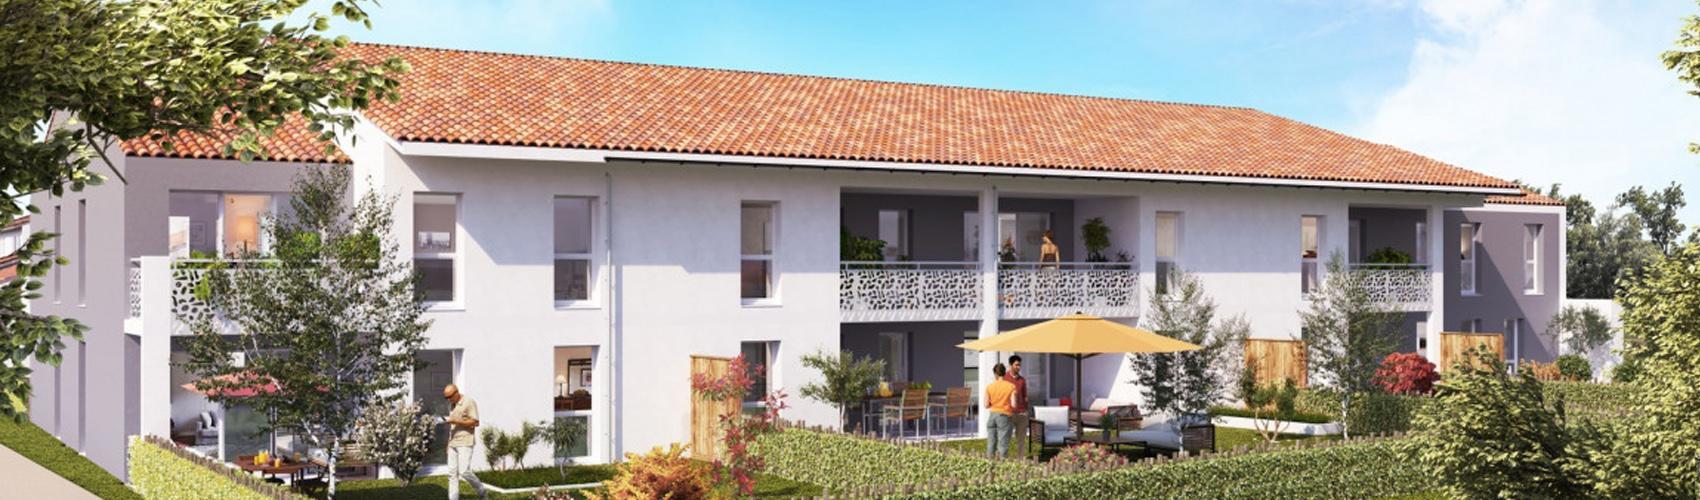 Photo du programme immobilier neuf NAQUI-1785 à Rochefort